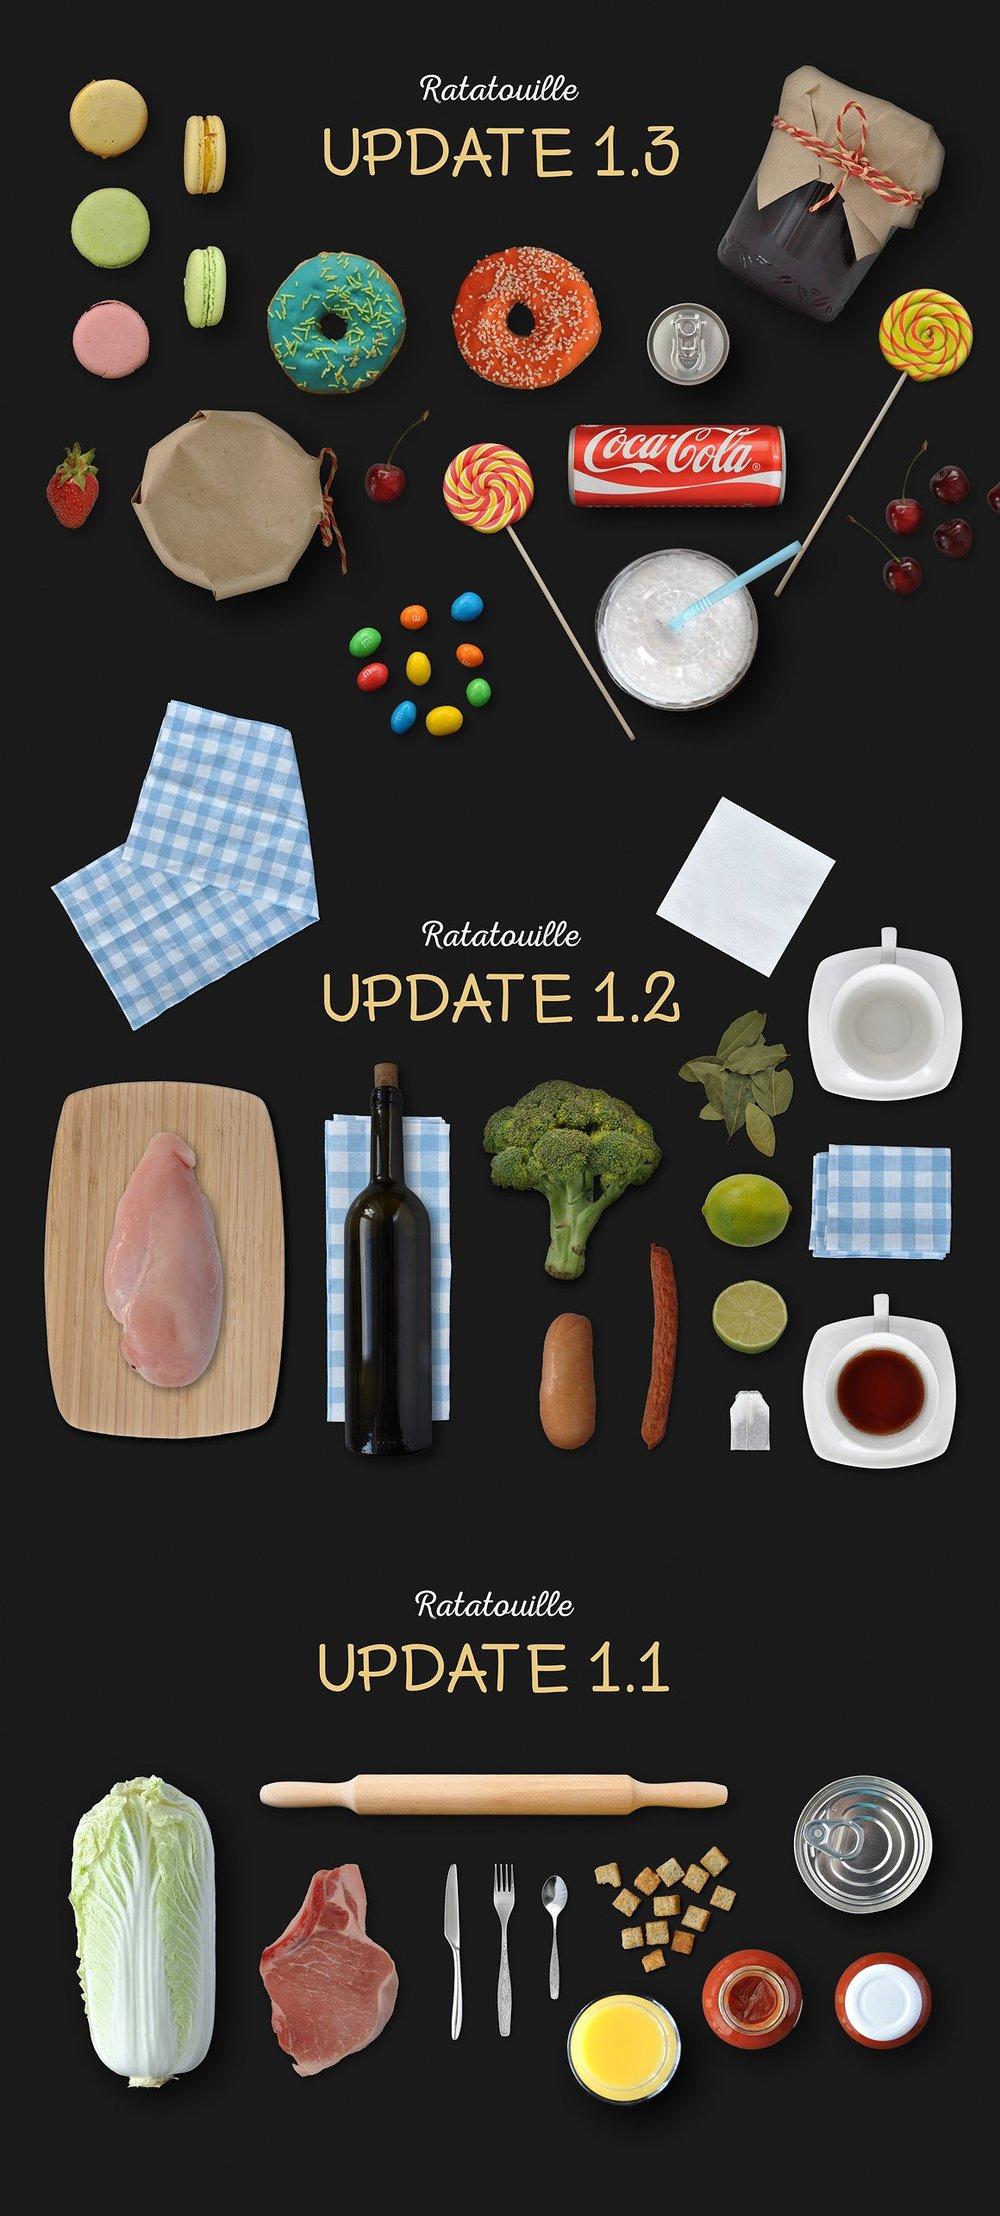 update-1.3-.jpg